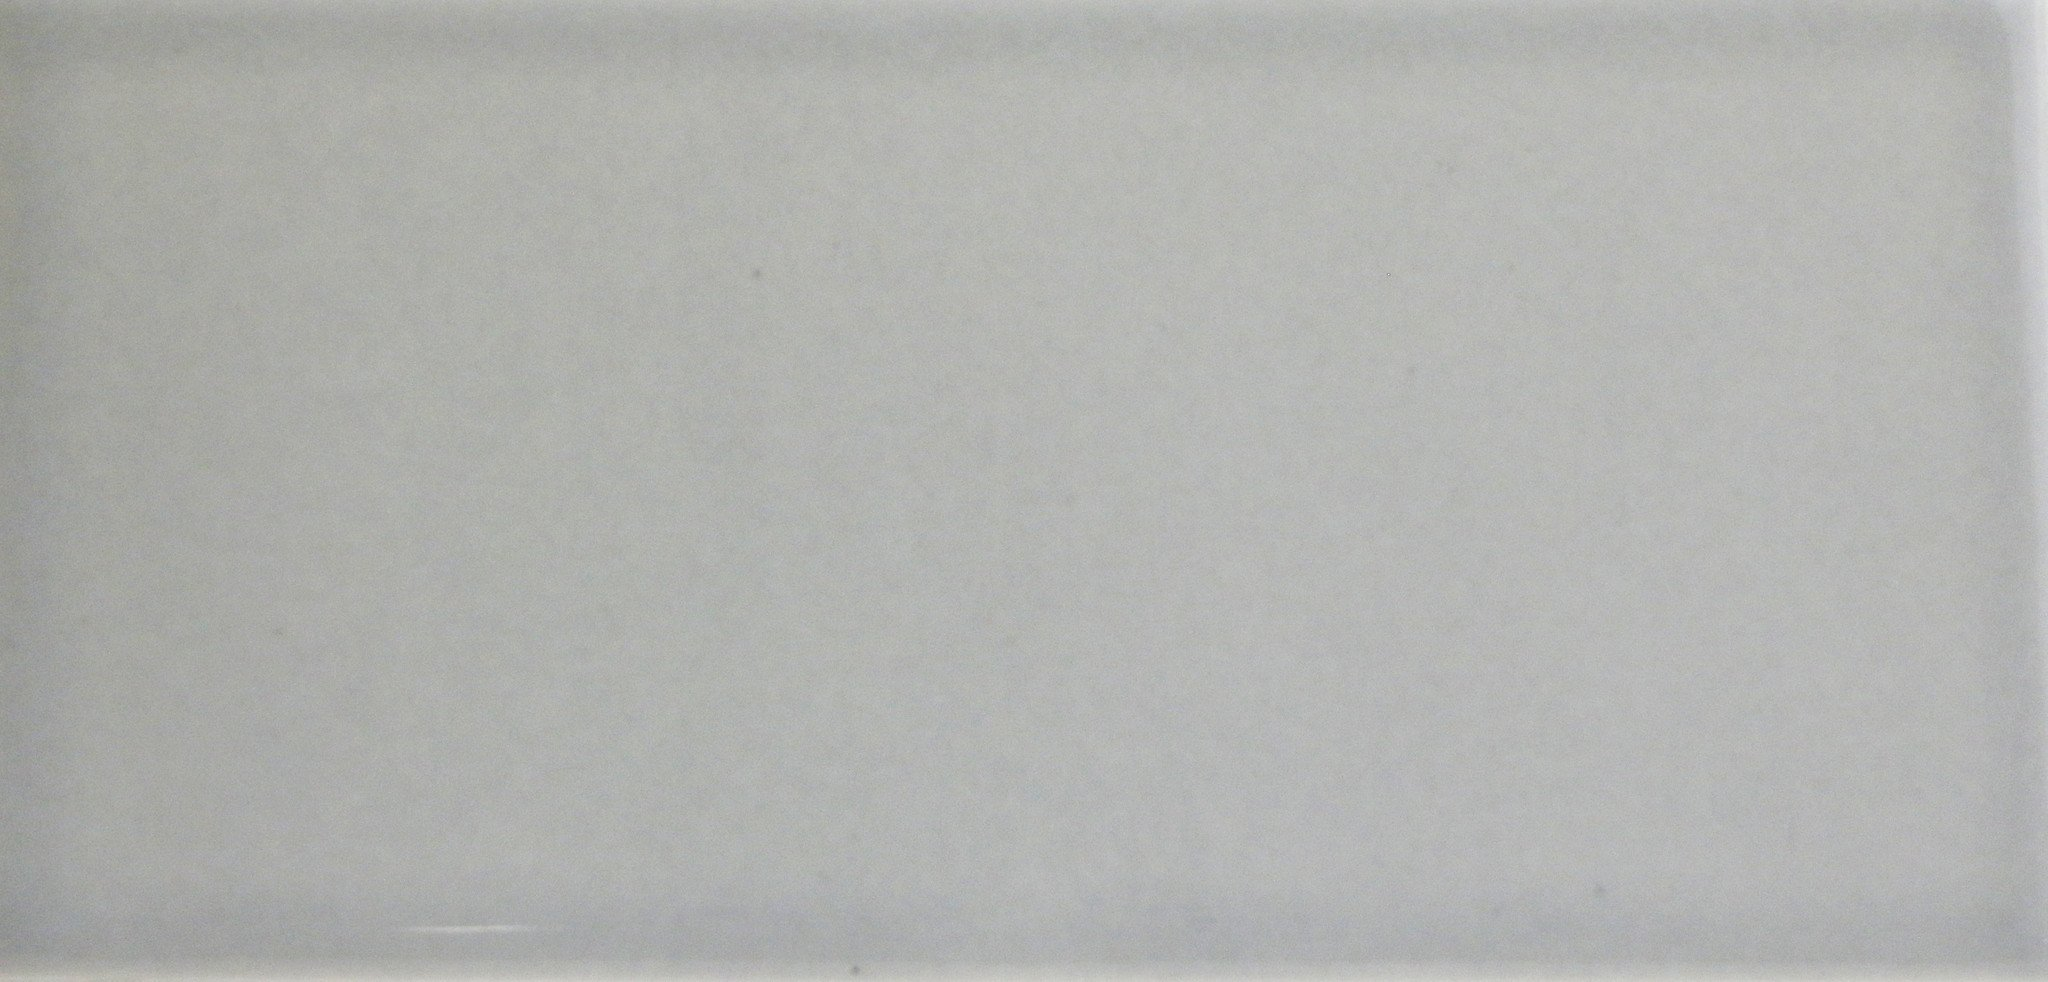 Waterworks Architectonics Field Tile 3 x 6 Bullnose Single (Short) in Gray